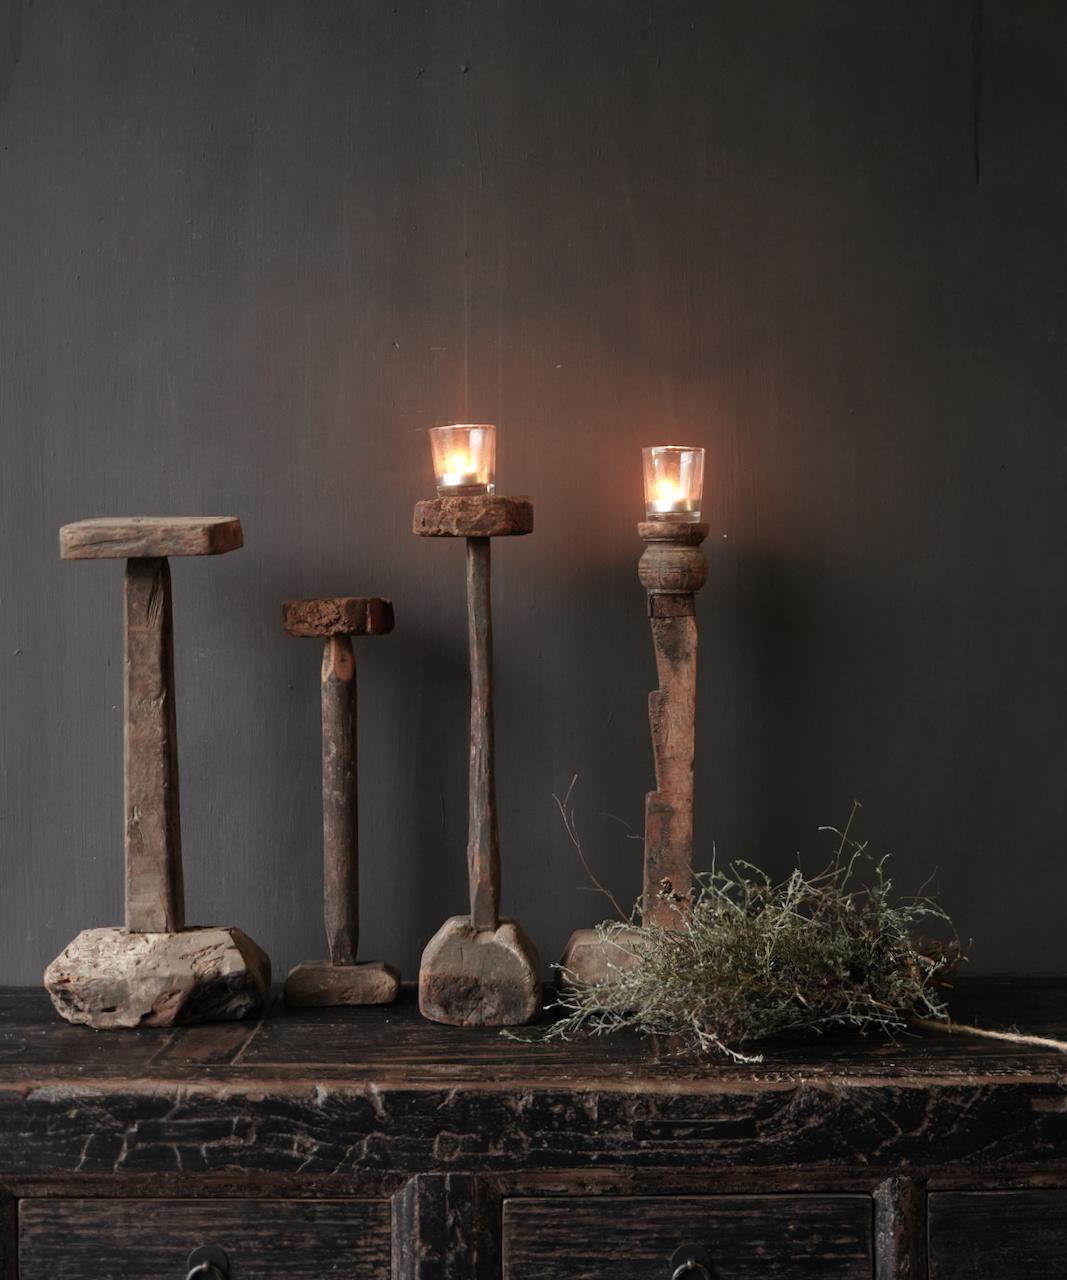 Wooden Stamper candlestick-1